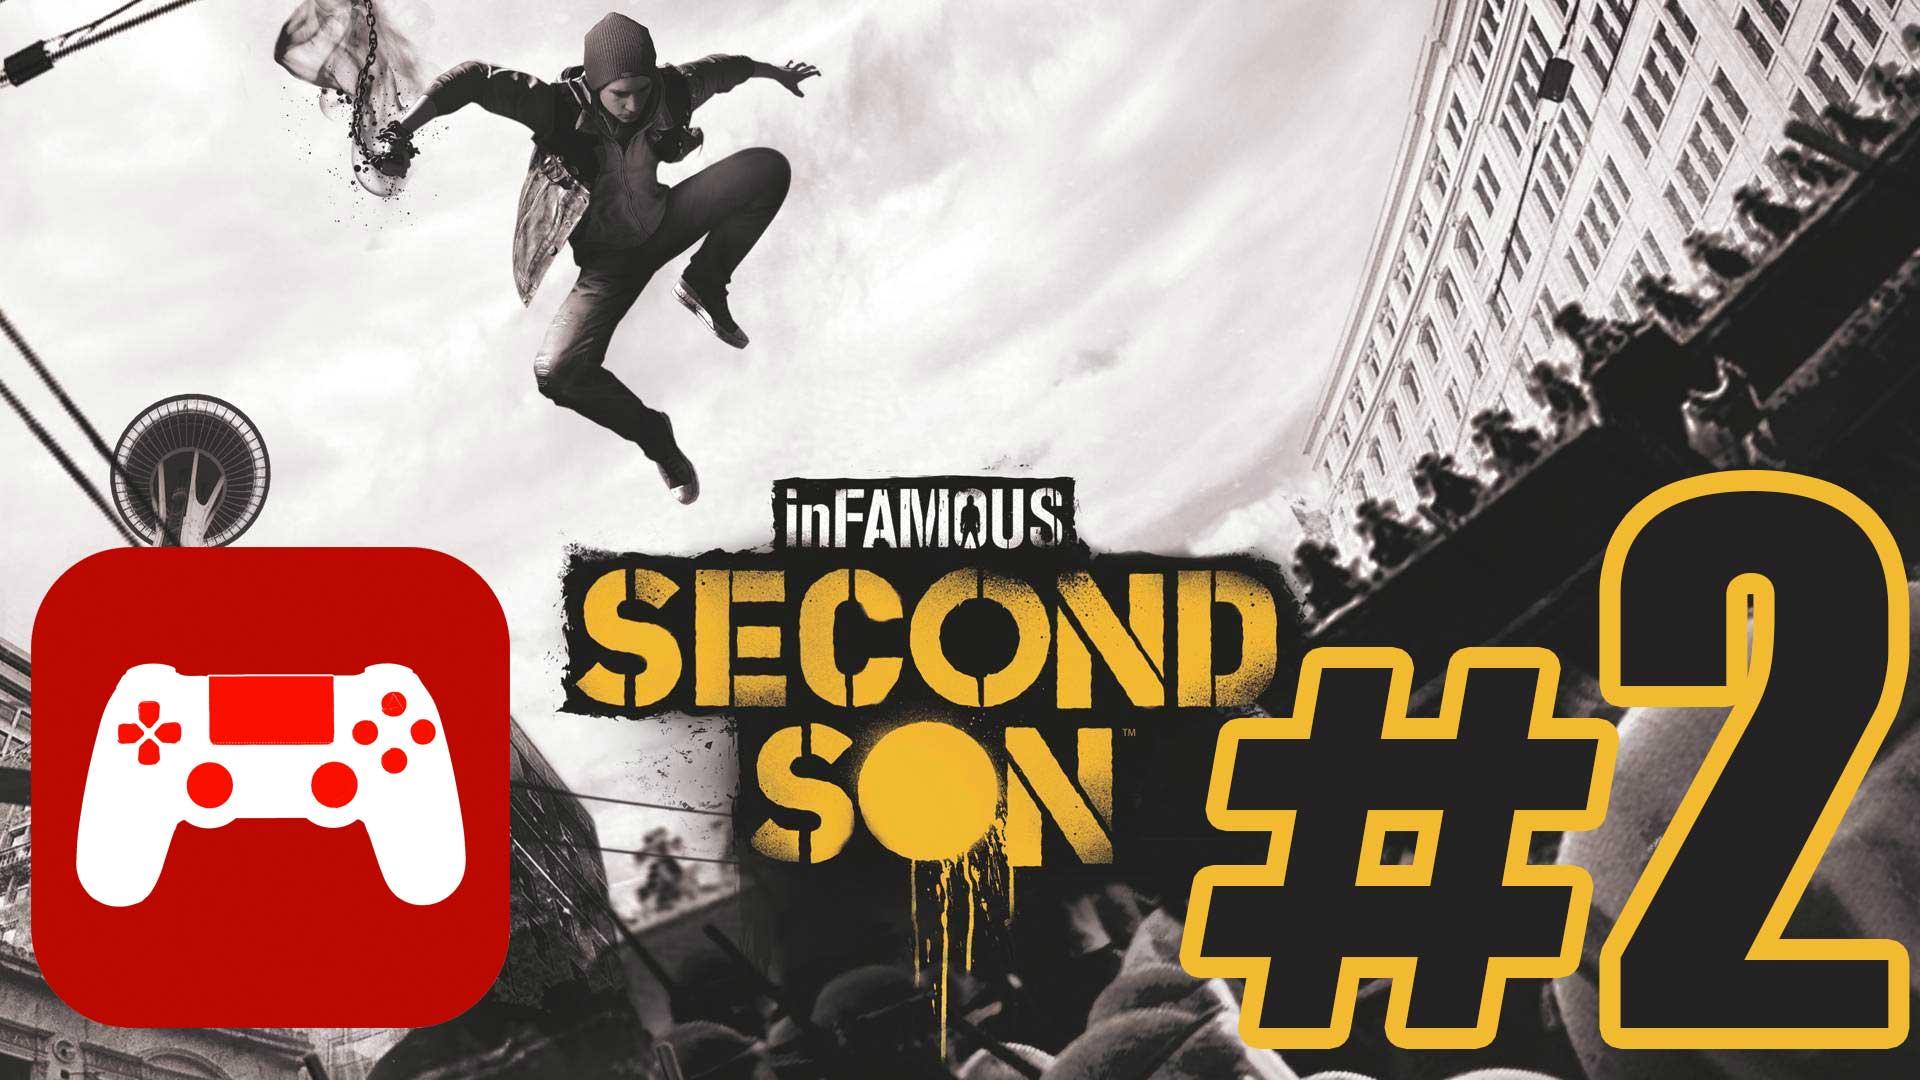 Let's Play inFamous Second Son #2 Der Raucher